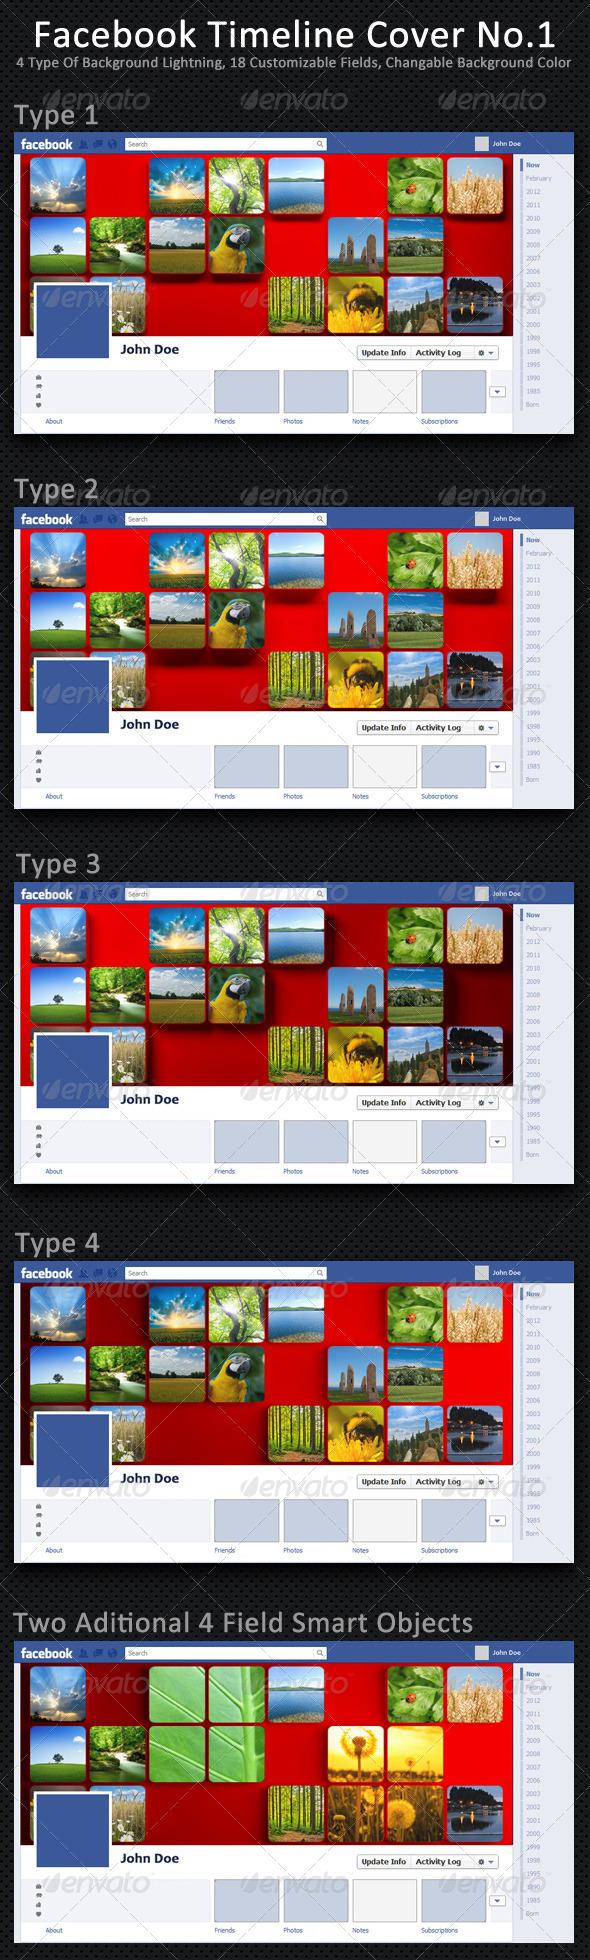 GraphicRiver Facebook Timeline Cover No.1 2853148